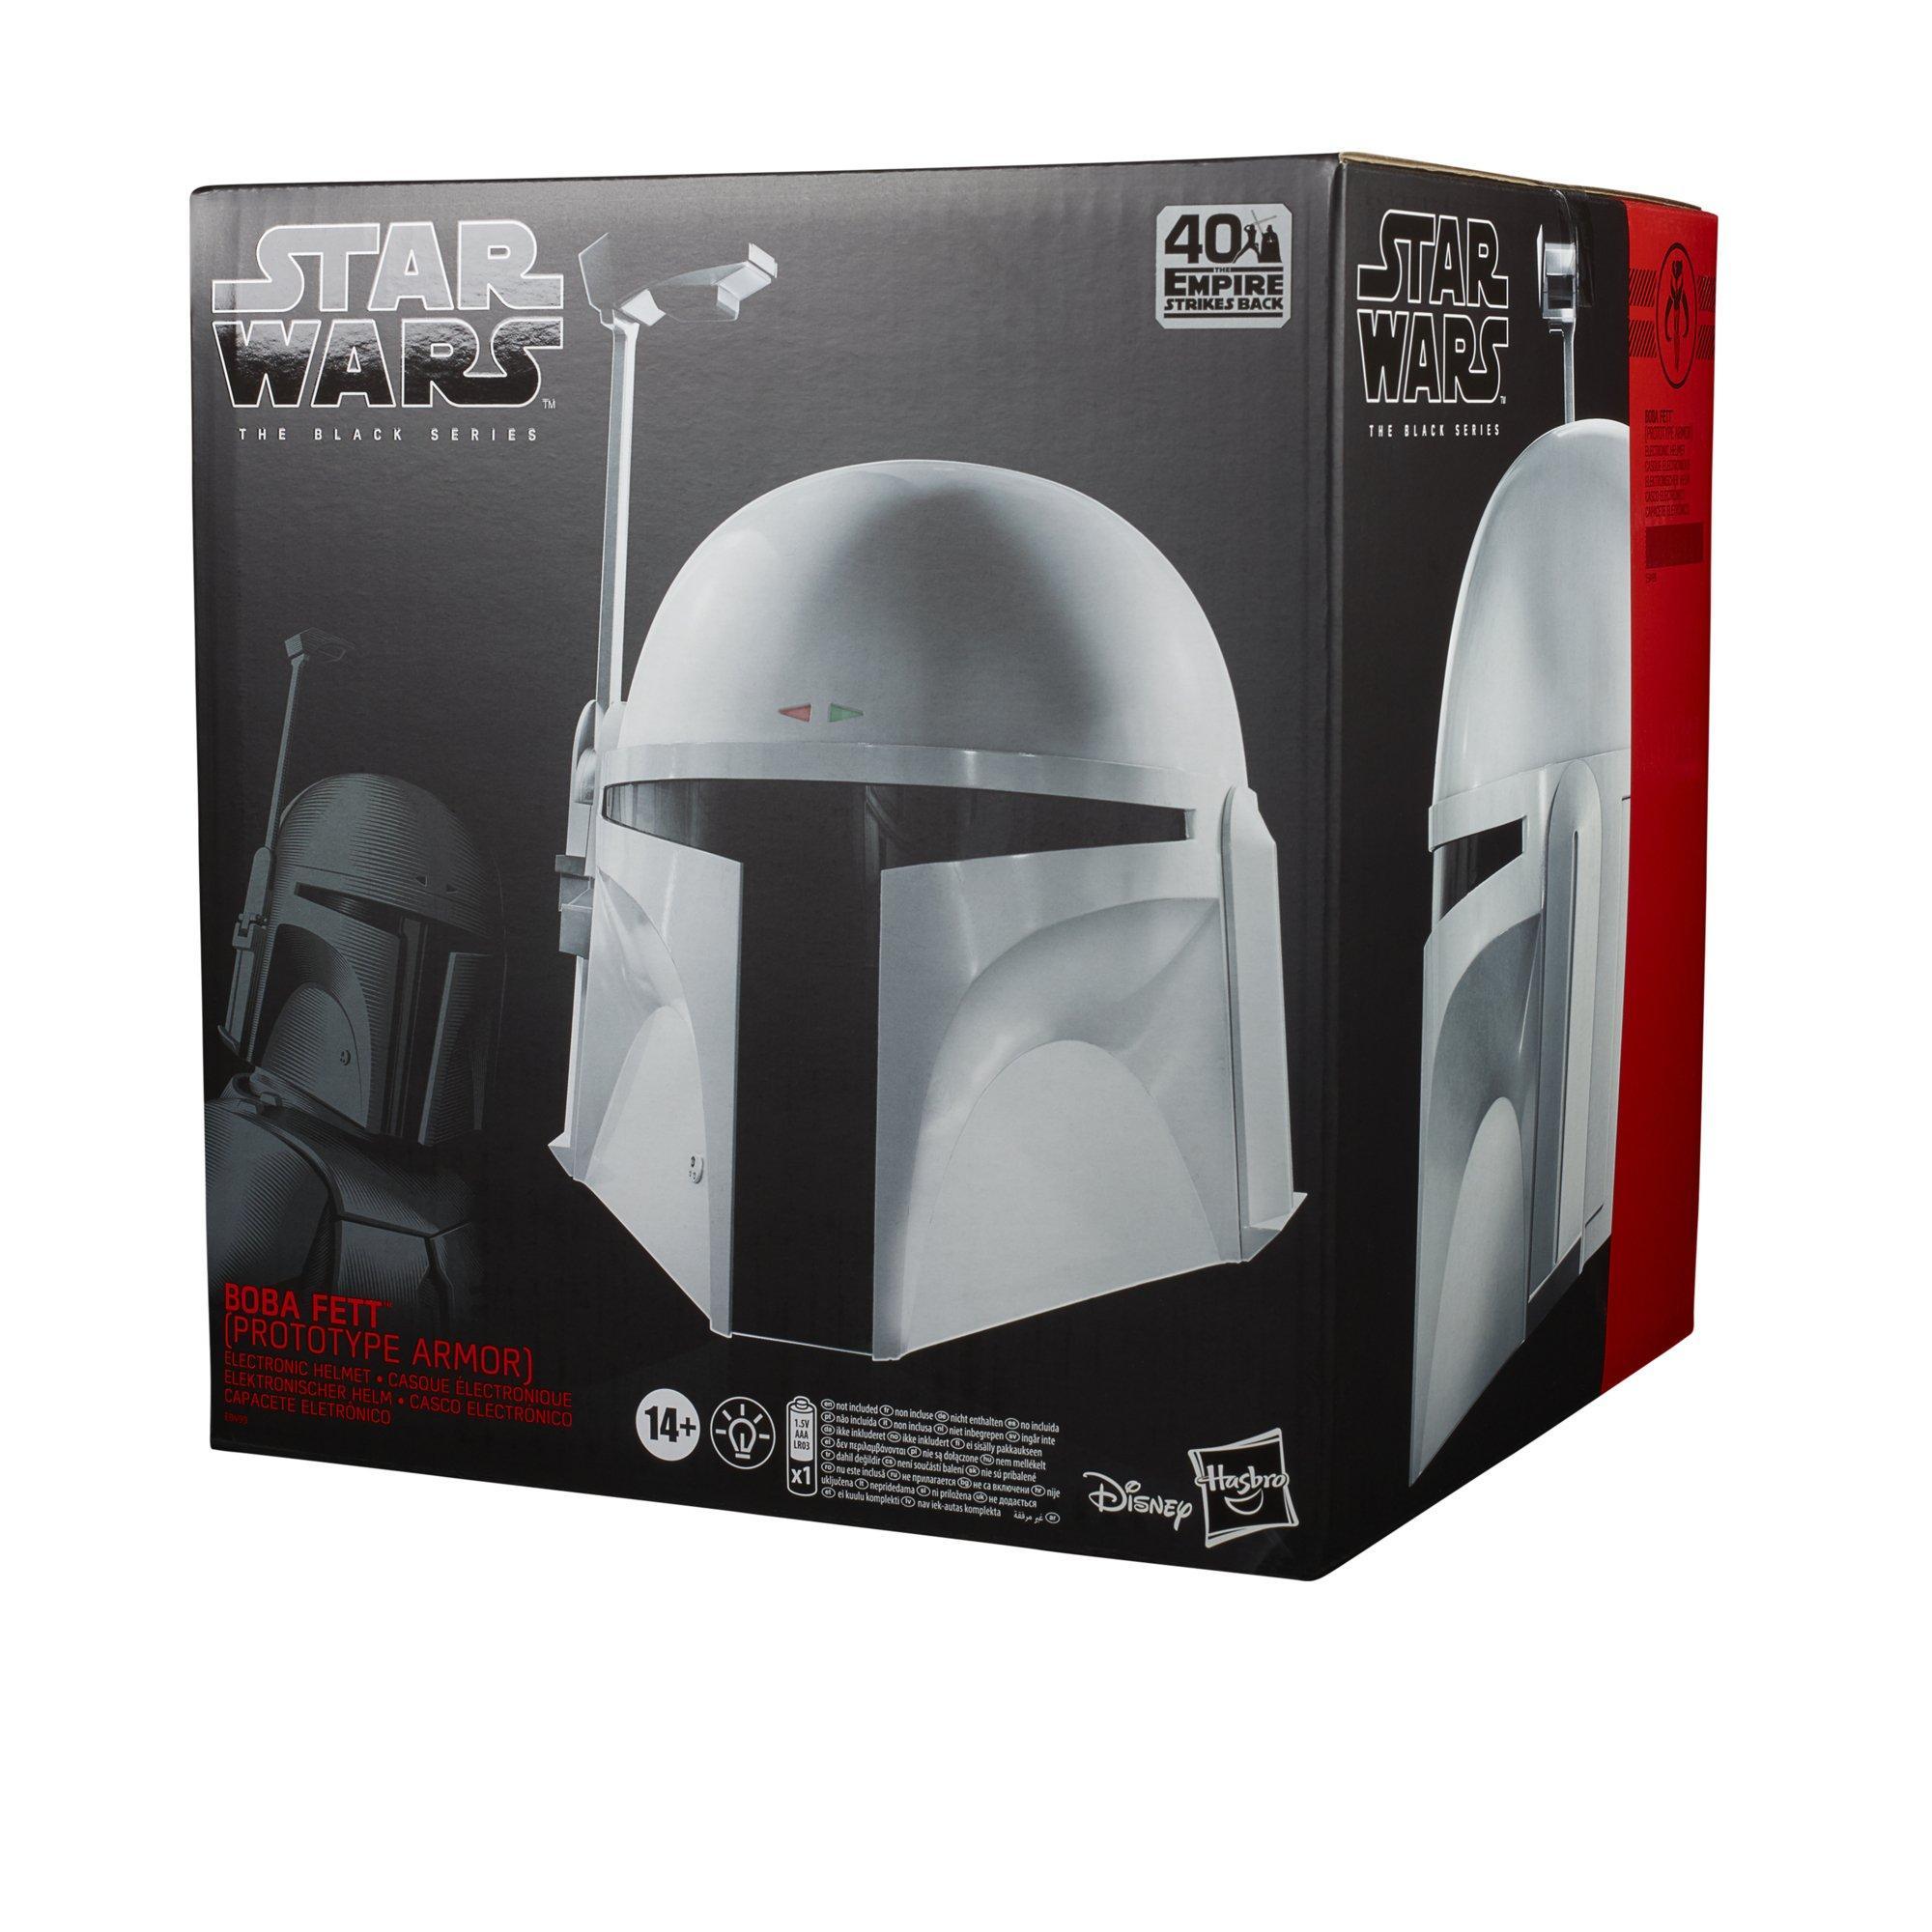 Star Wars The Empire Strikes Back 40th Anniversary Boba Fett Prototype Armor The Black Series Helmet Gamestop